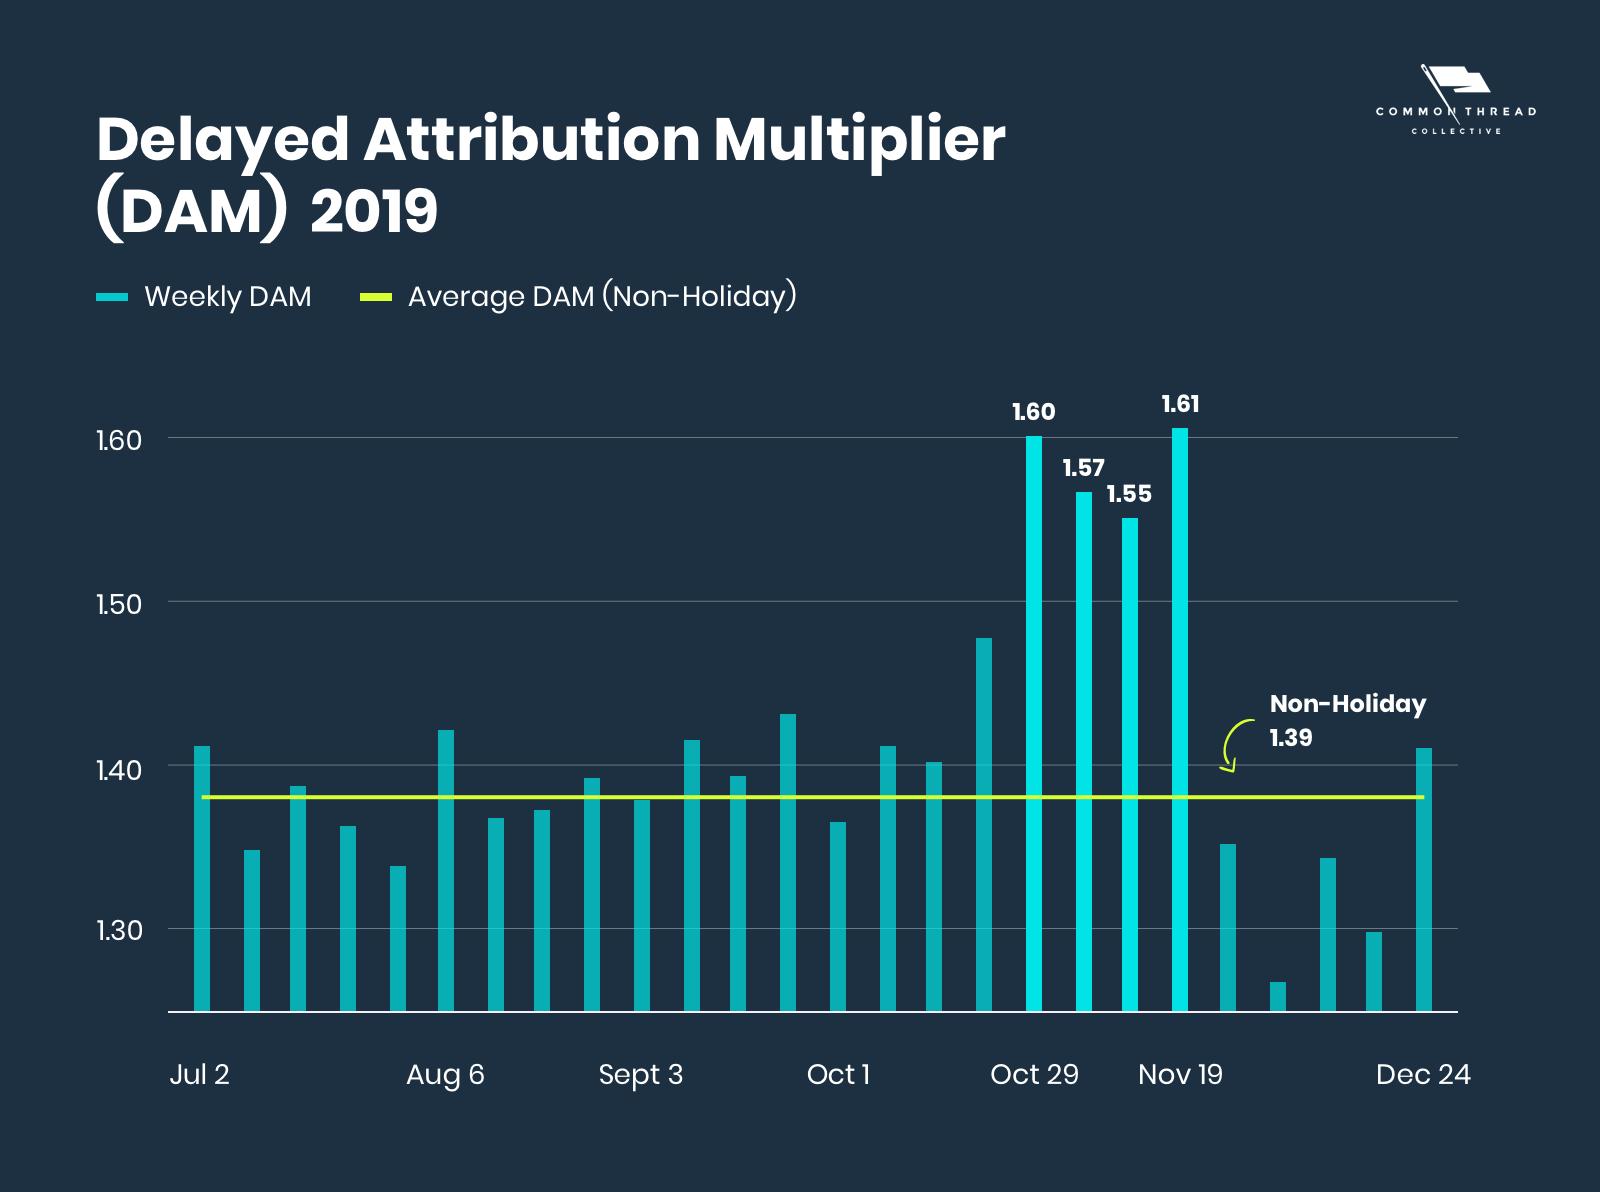 Delayed Attribution Multiplier (DAM) Average over 2019